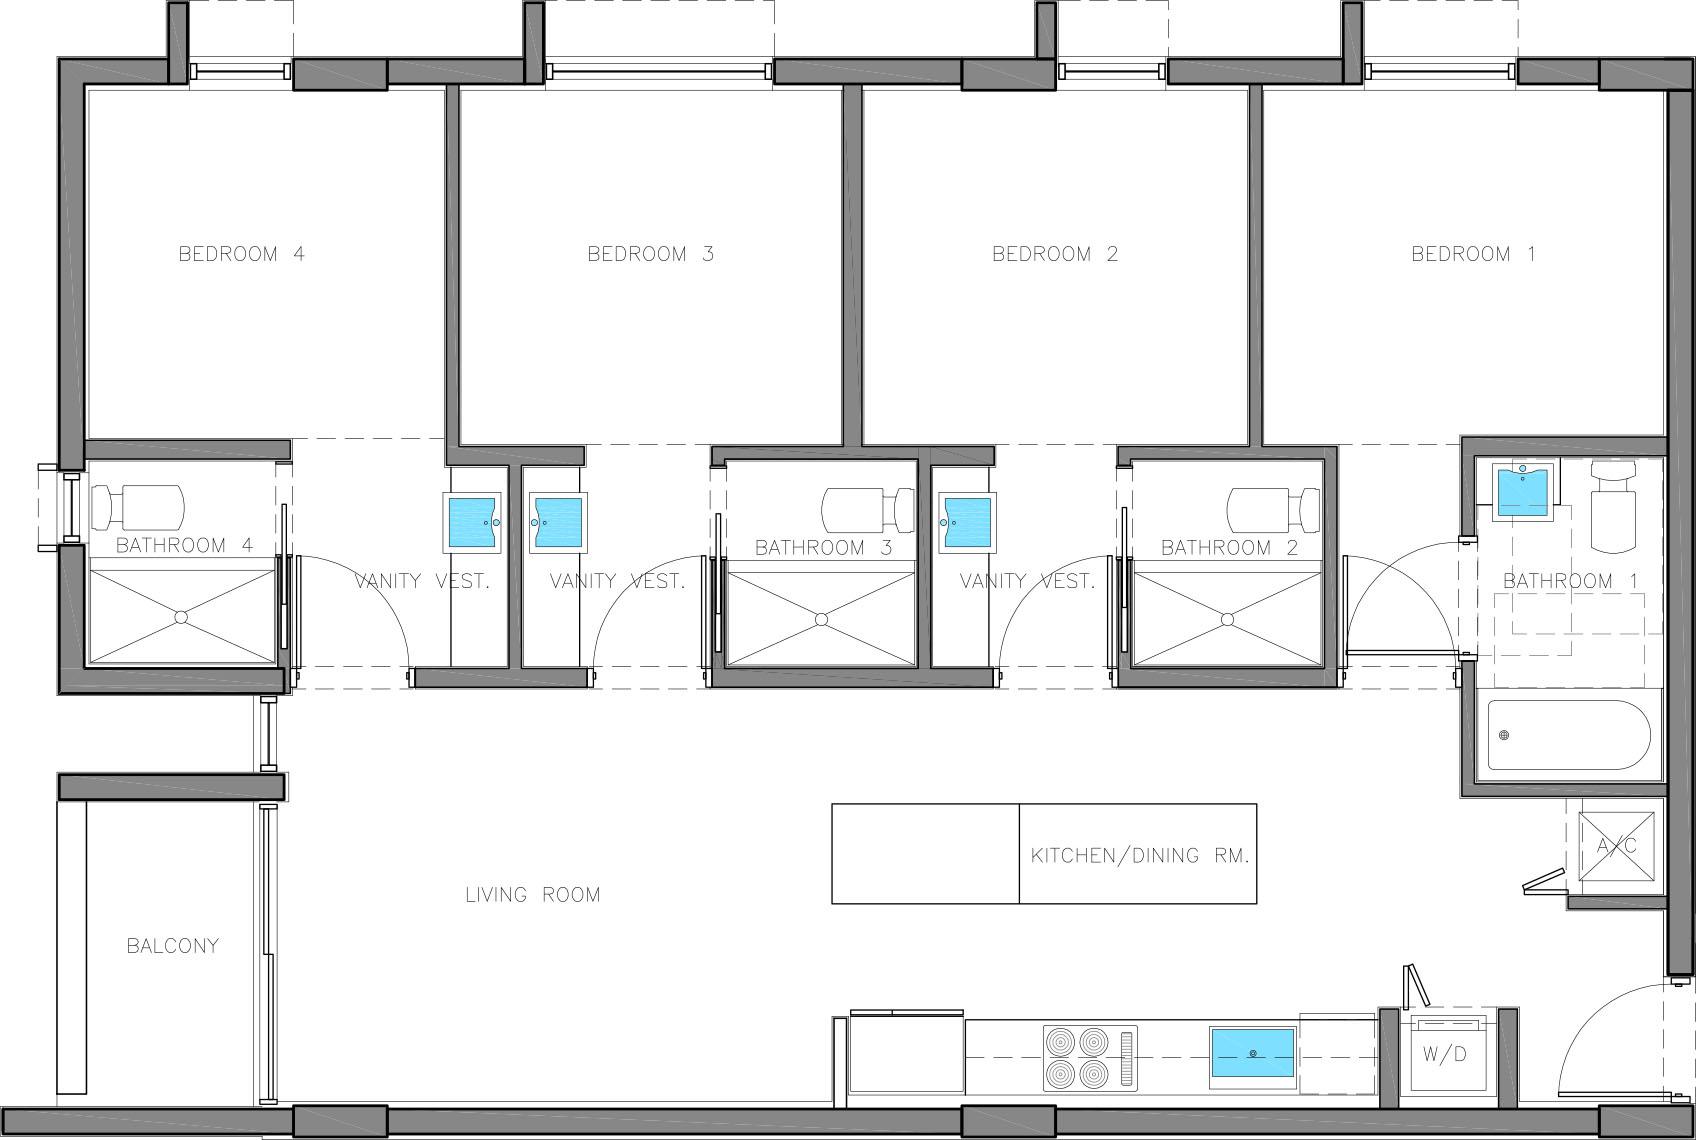 cane house floorplan2.8-6-15.jpg